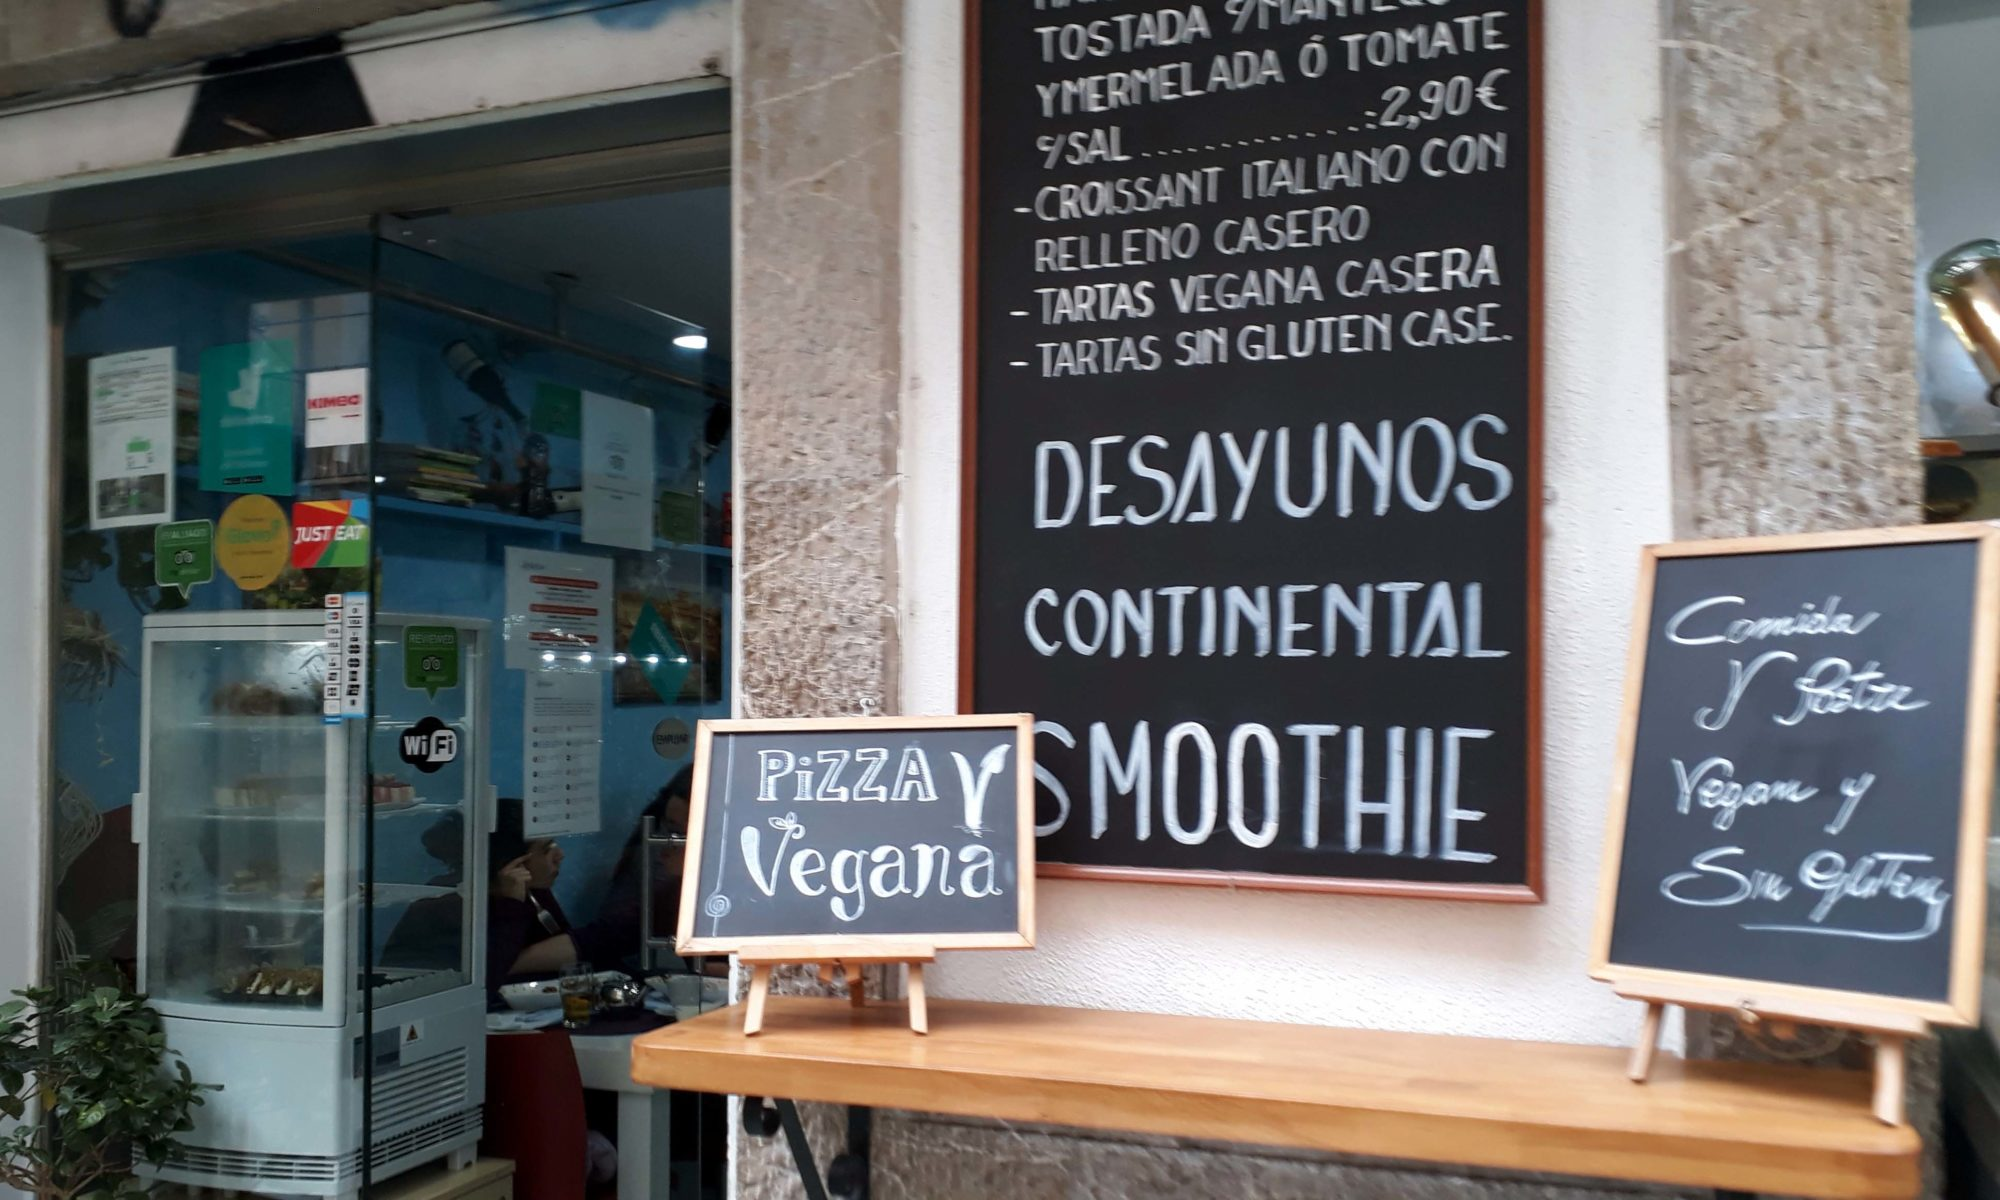 Vegan in Palma de Mallorca